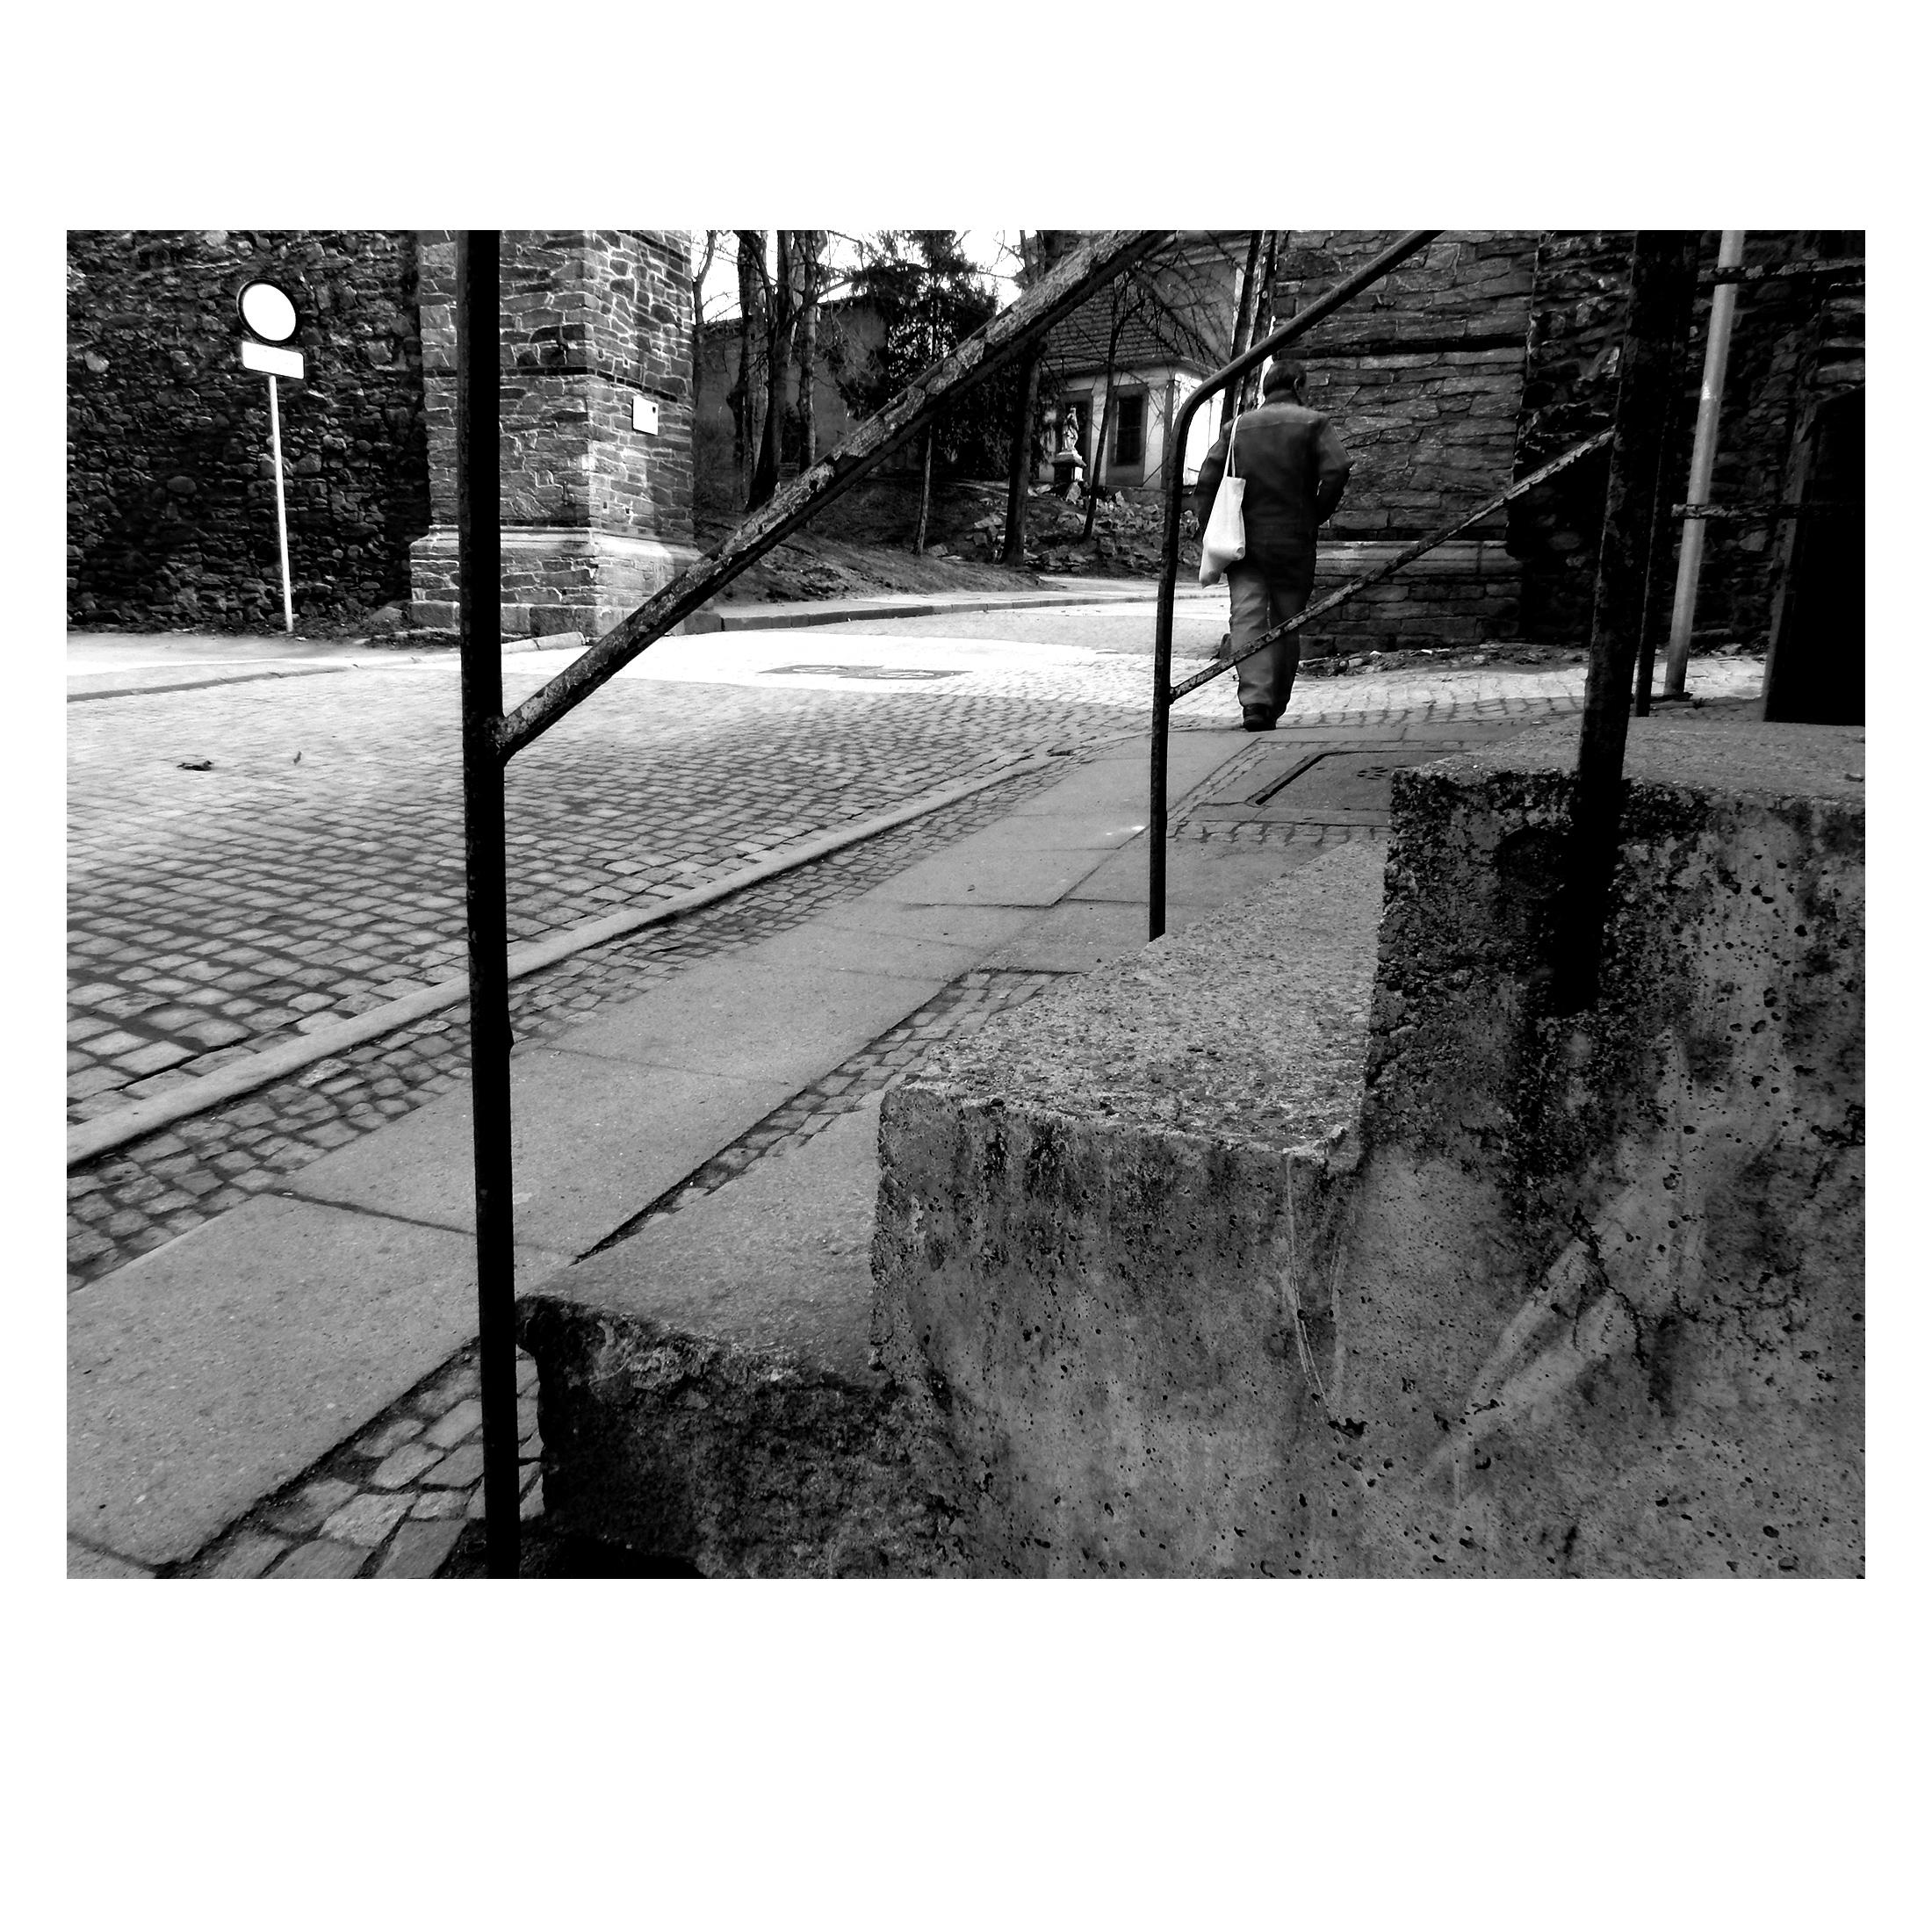 Wanderer - bnw, blackandwhitephoto - brthelemy   ello